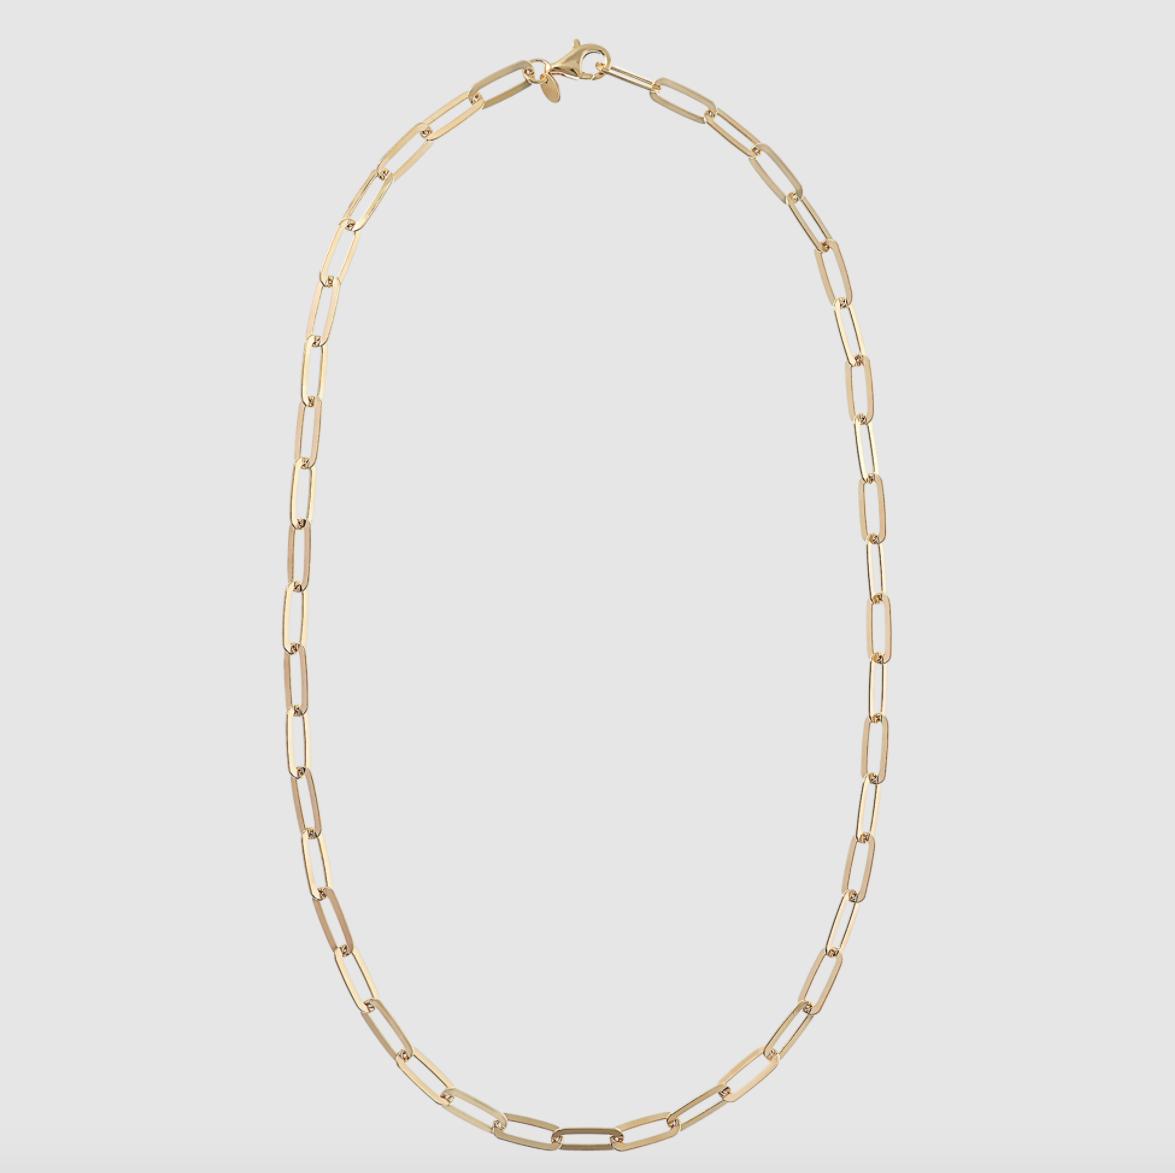 Just Jill Shop necklace